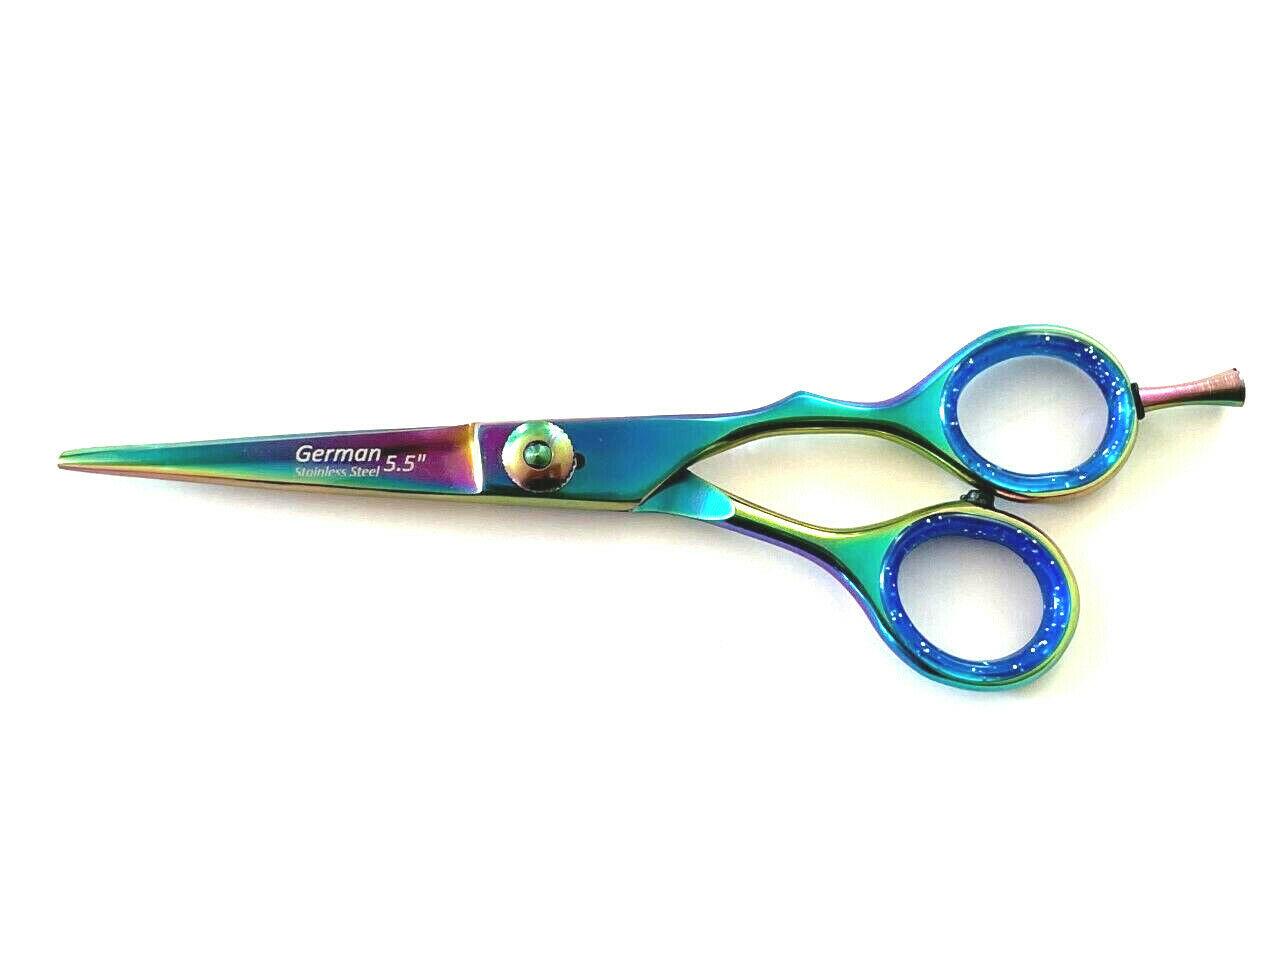 GERMAN Pet Grooming Hair Trimming , Multi Color High-Quality Scissors